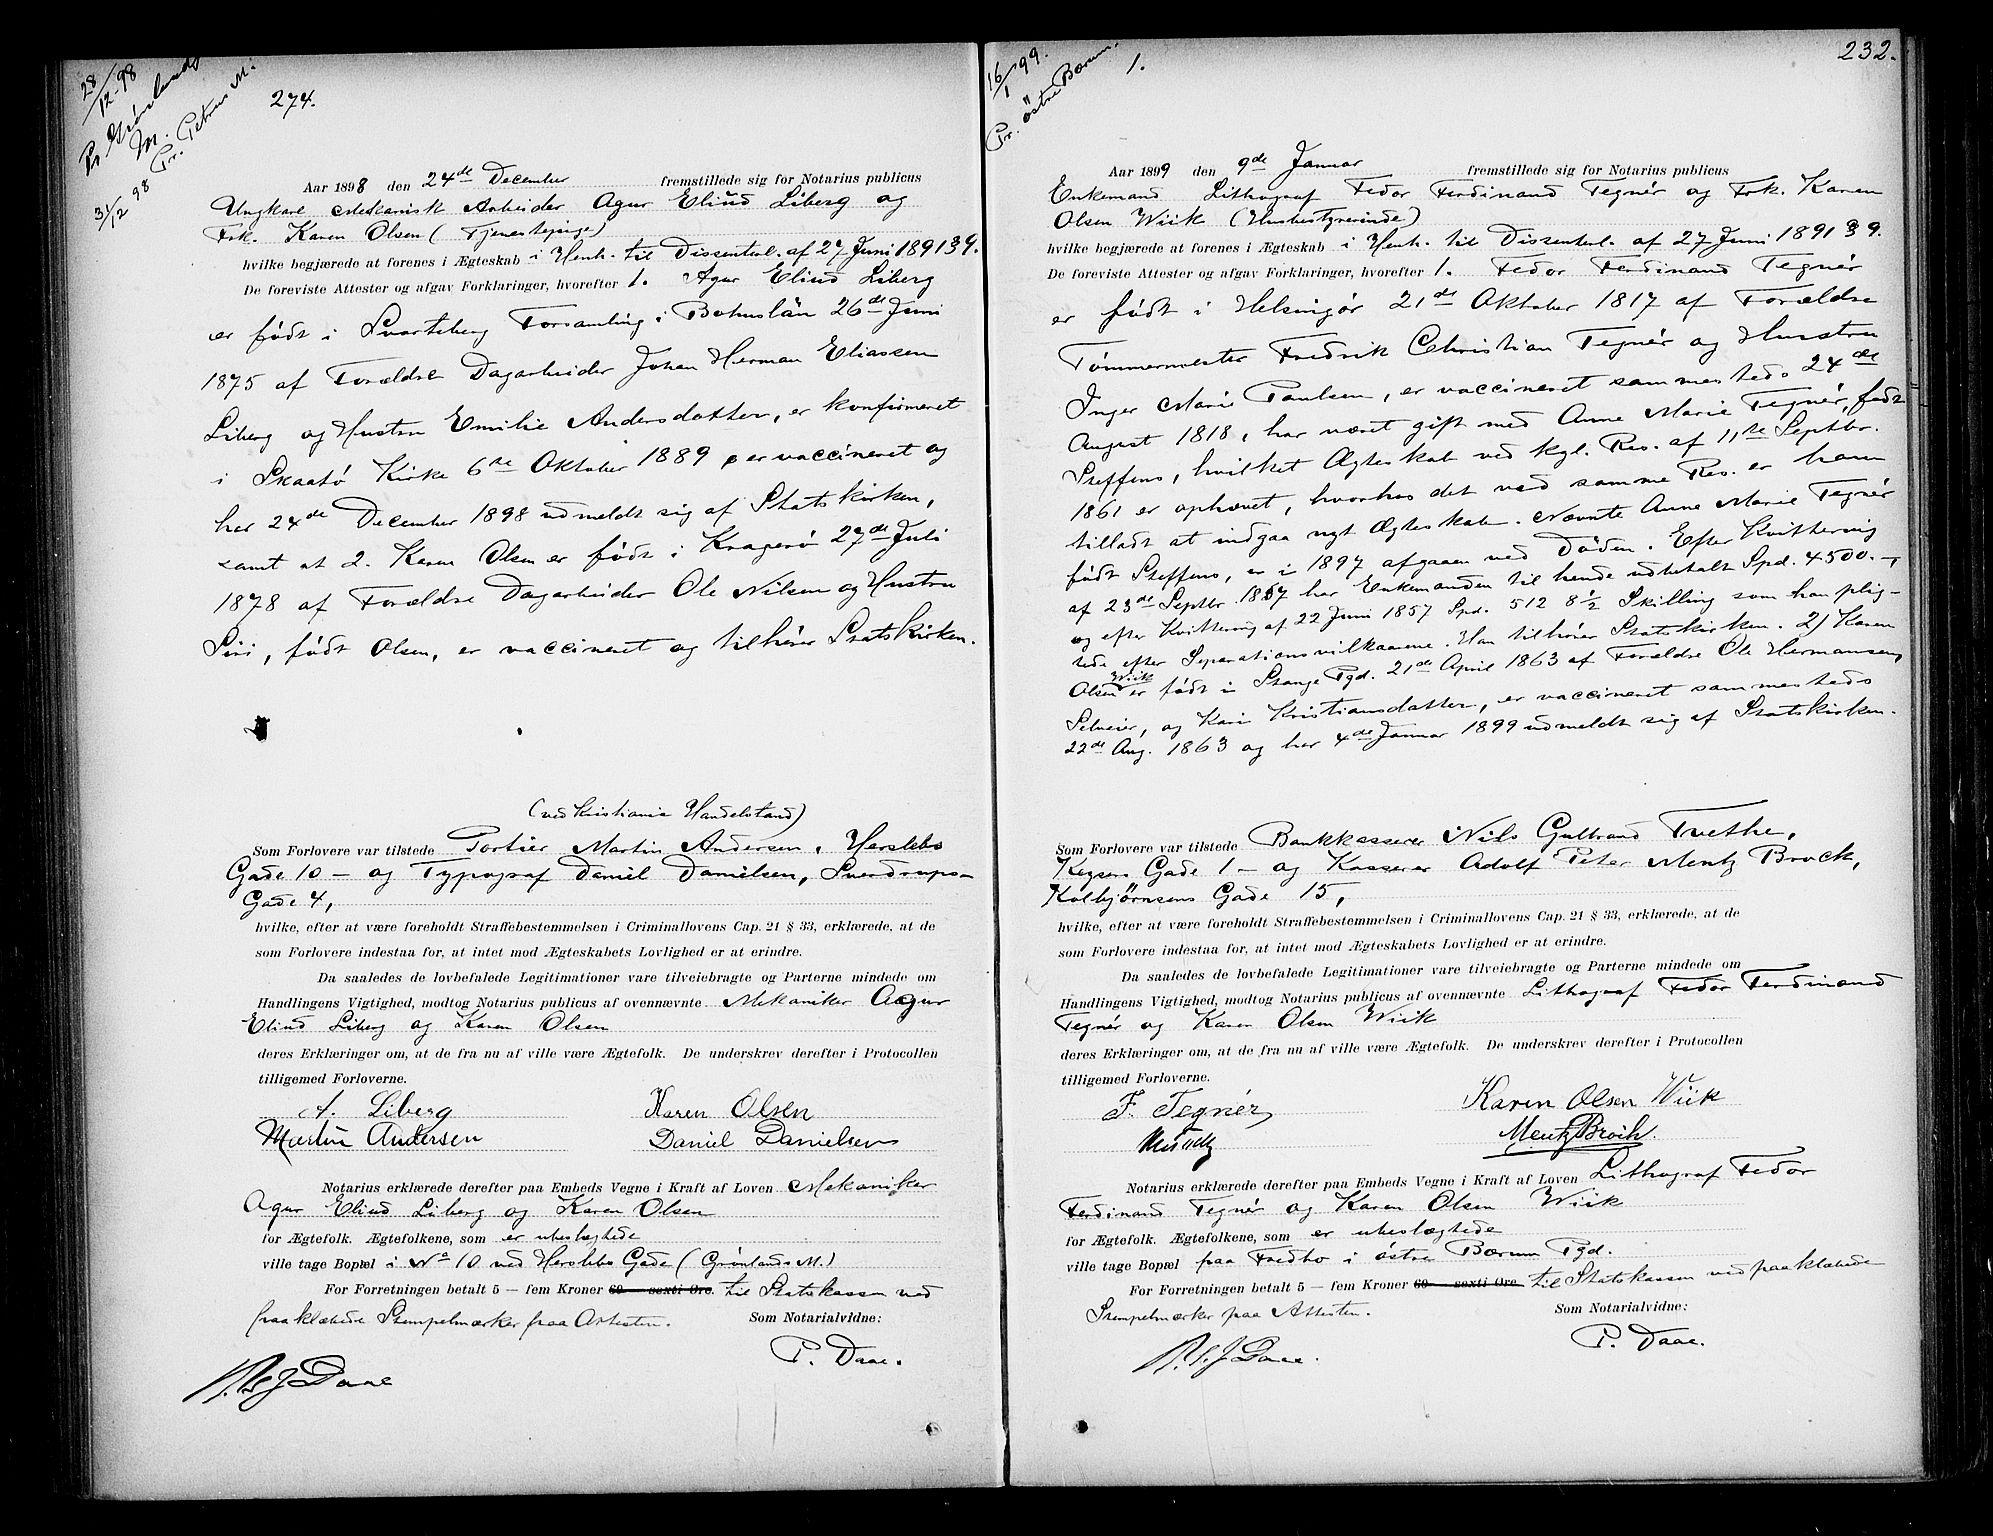 SAO, Oslo byfogd avd. I, L/Lb/Lbb/L0005: Notarialprotokoll, rekke II: Vigsler, 1897-1902, s. 231b-232a